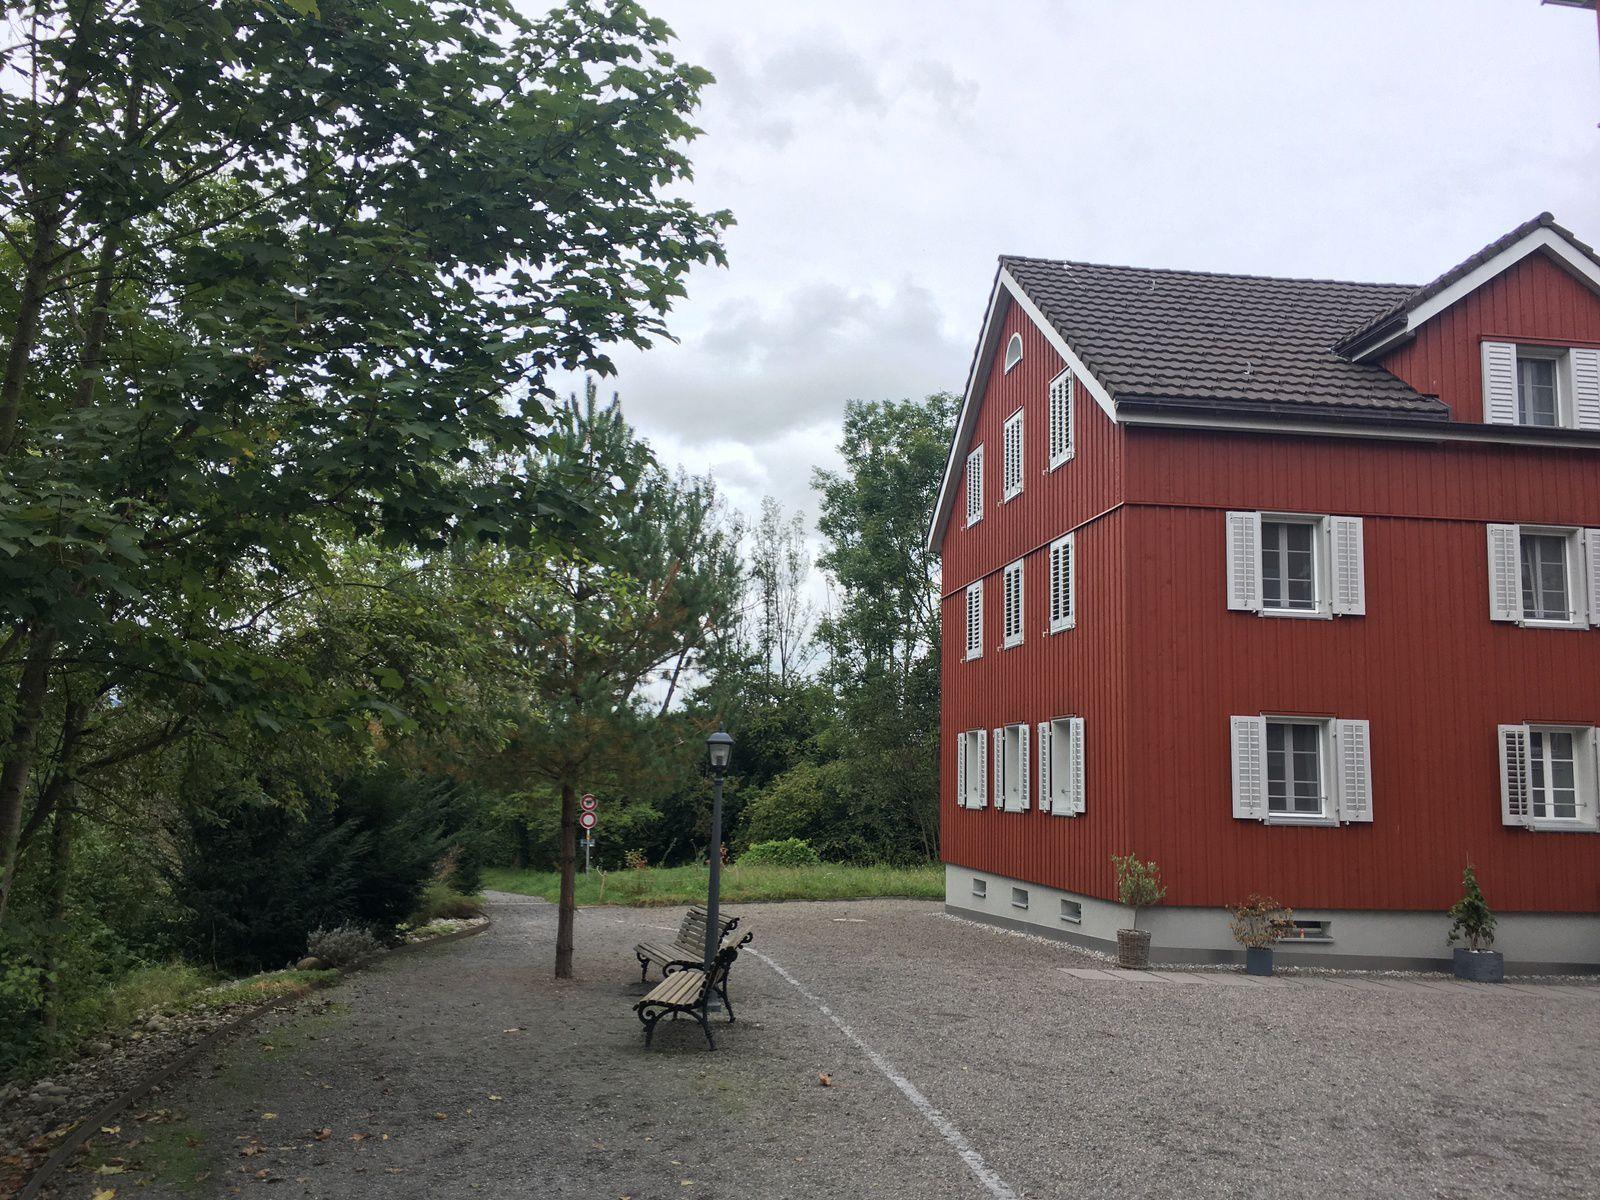 20 septembre 2021 : Cham / Lozenweg de Cham a Hagendorn